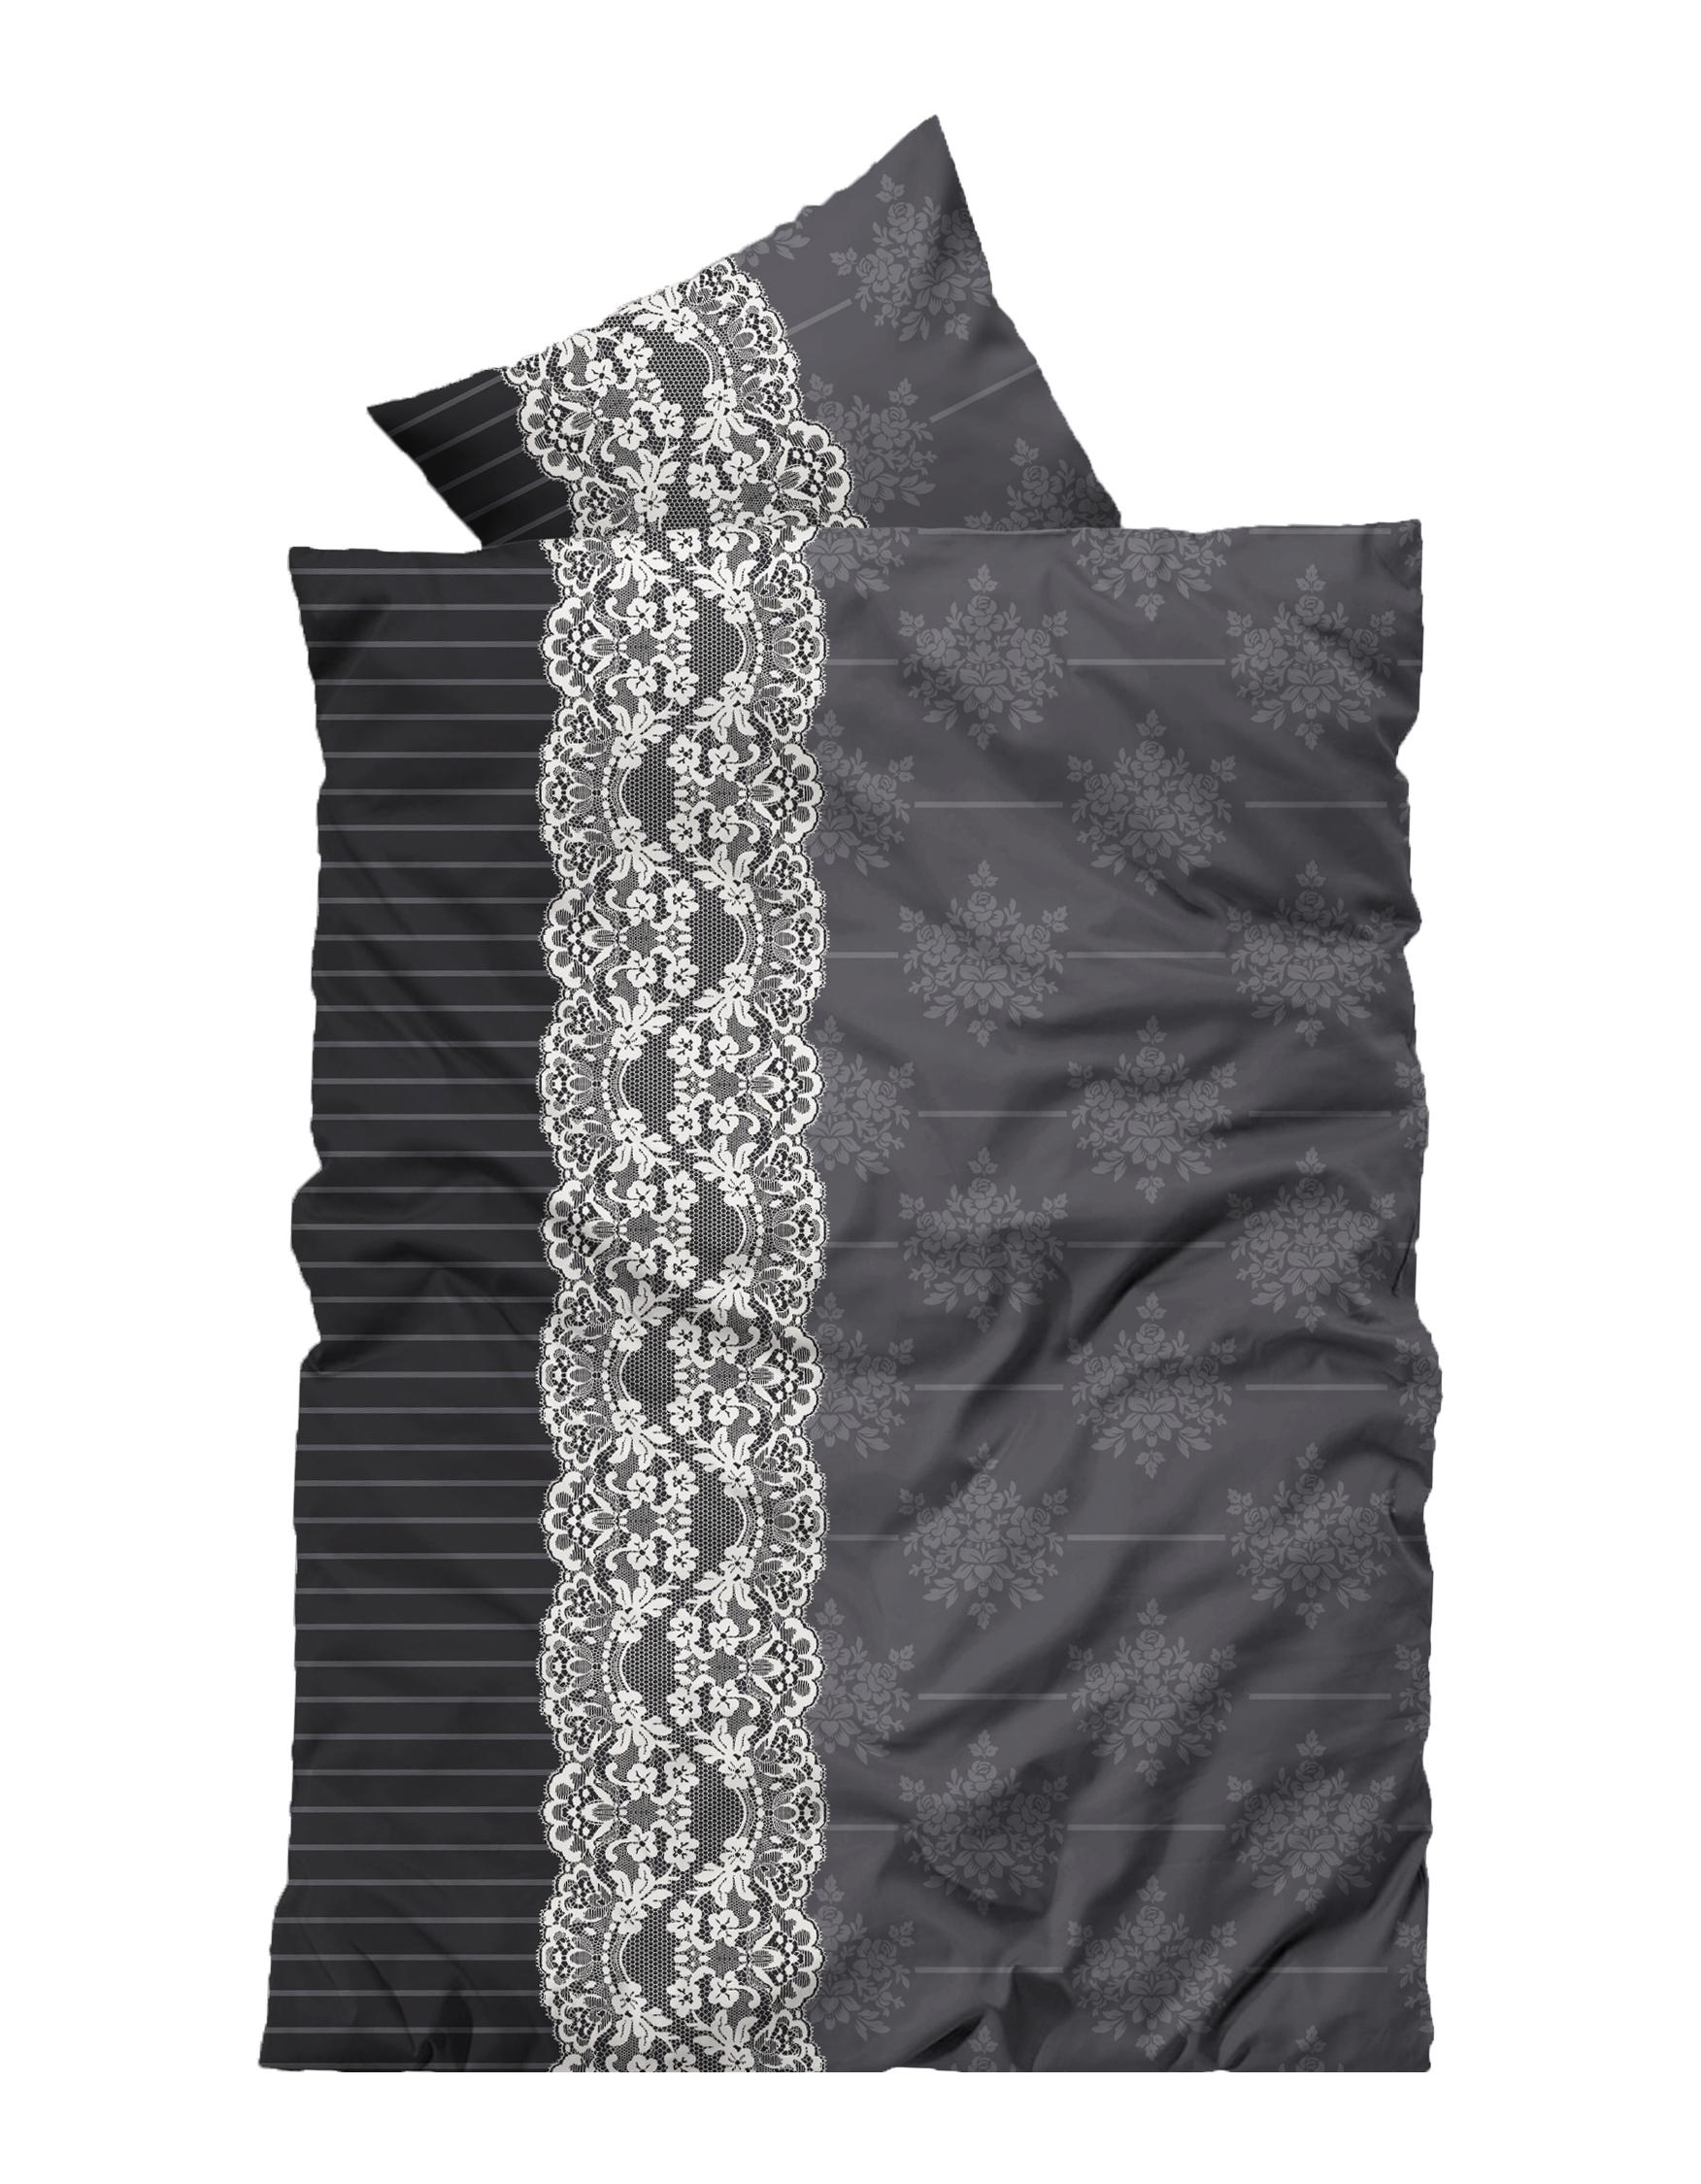 4 teilig thermofleece bettw sche 155x220 cm ornamente grau schwarz bergr e bettw sche. Black Bedroom Furniture Sets. Home Design Ideas